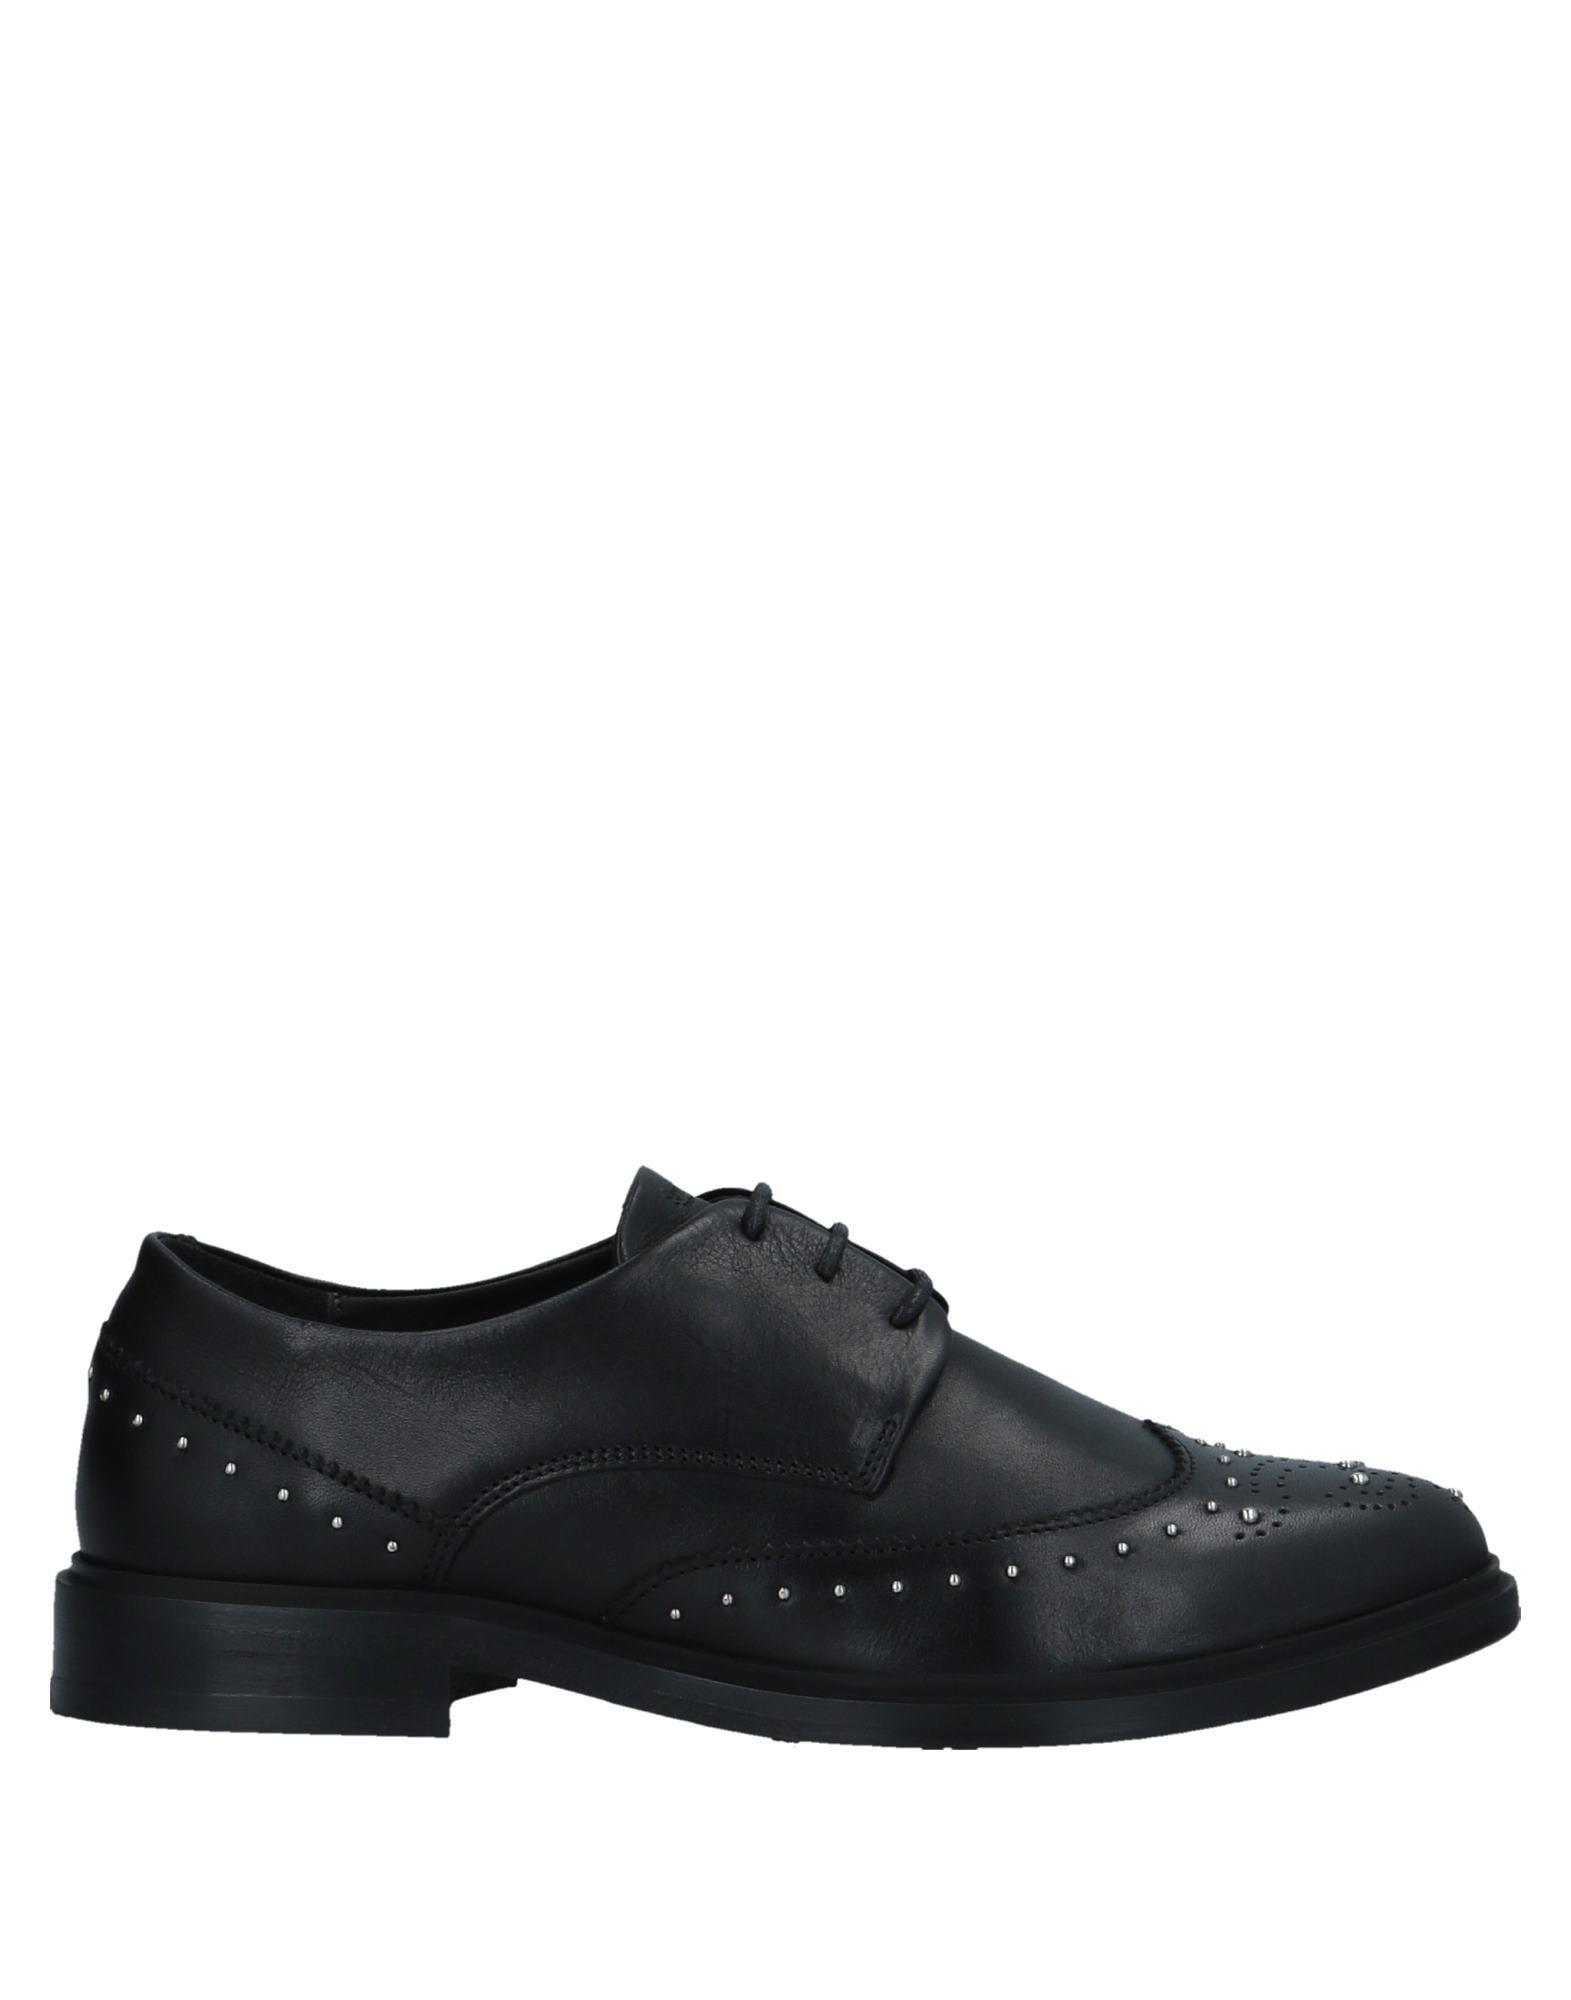 Royal Republiq Schnürschuhe Damen  11543345SHGut aussehende strapazierfähige Schuhe